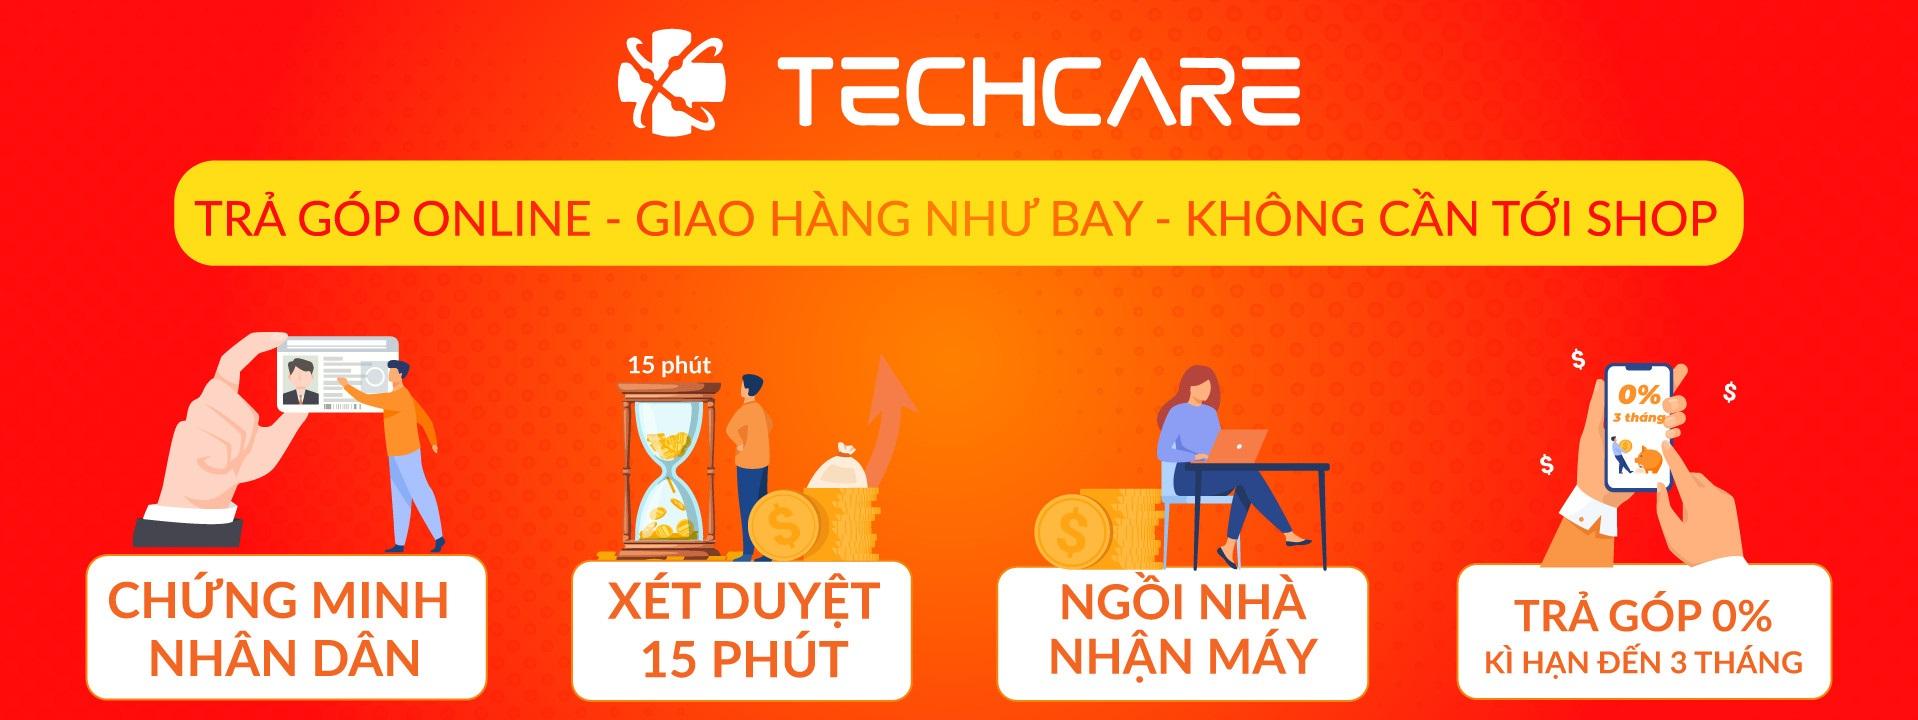 techcare-tra-gop-online